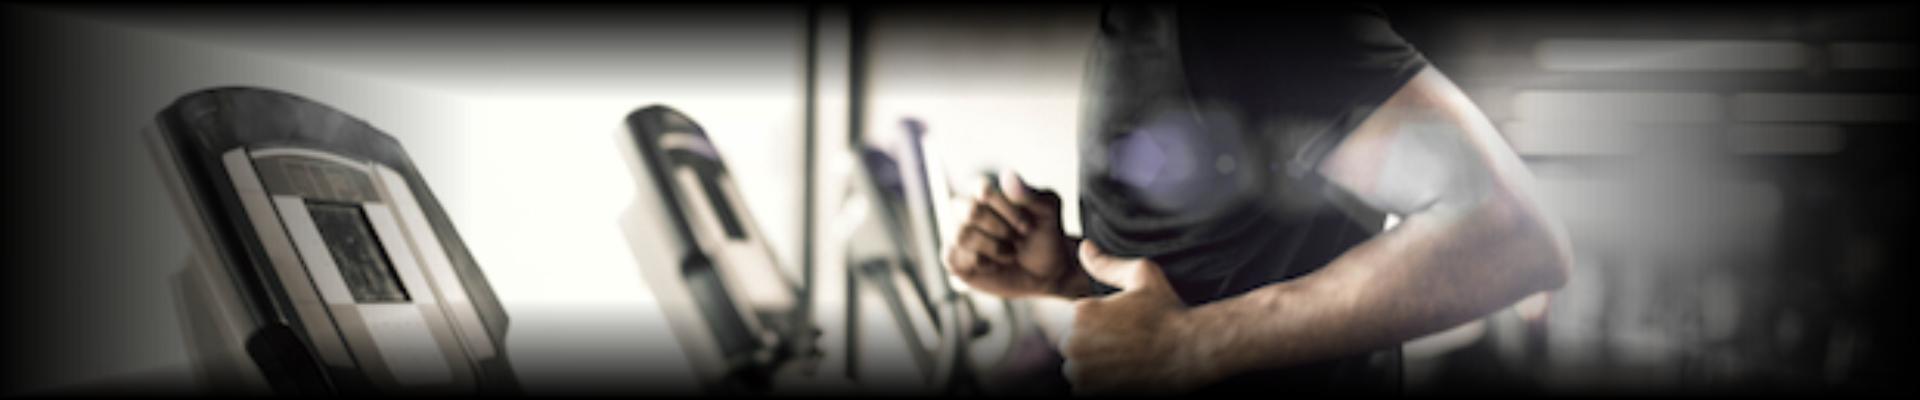 Basic Fitness; vrij trainen cardio en fitness bij JudoYushi - VennepFit